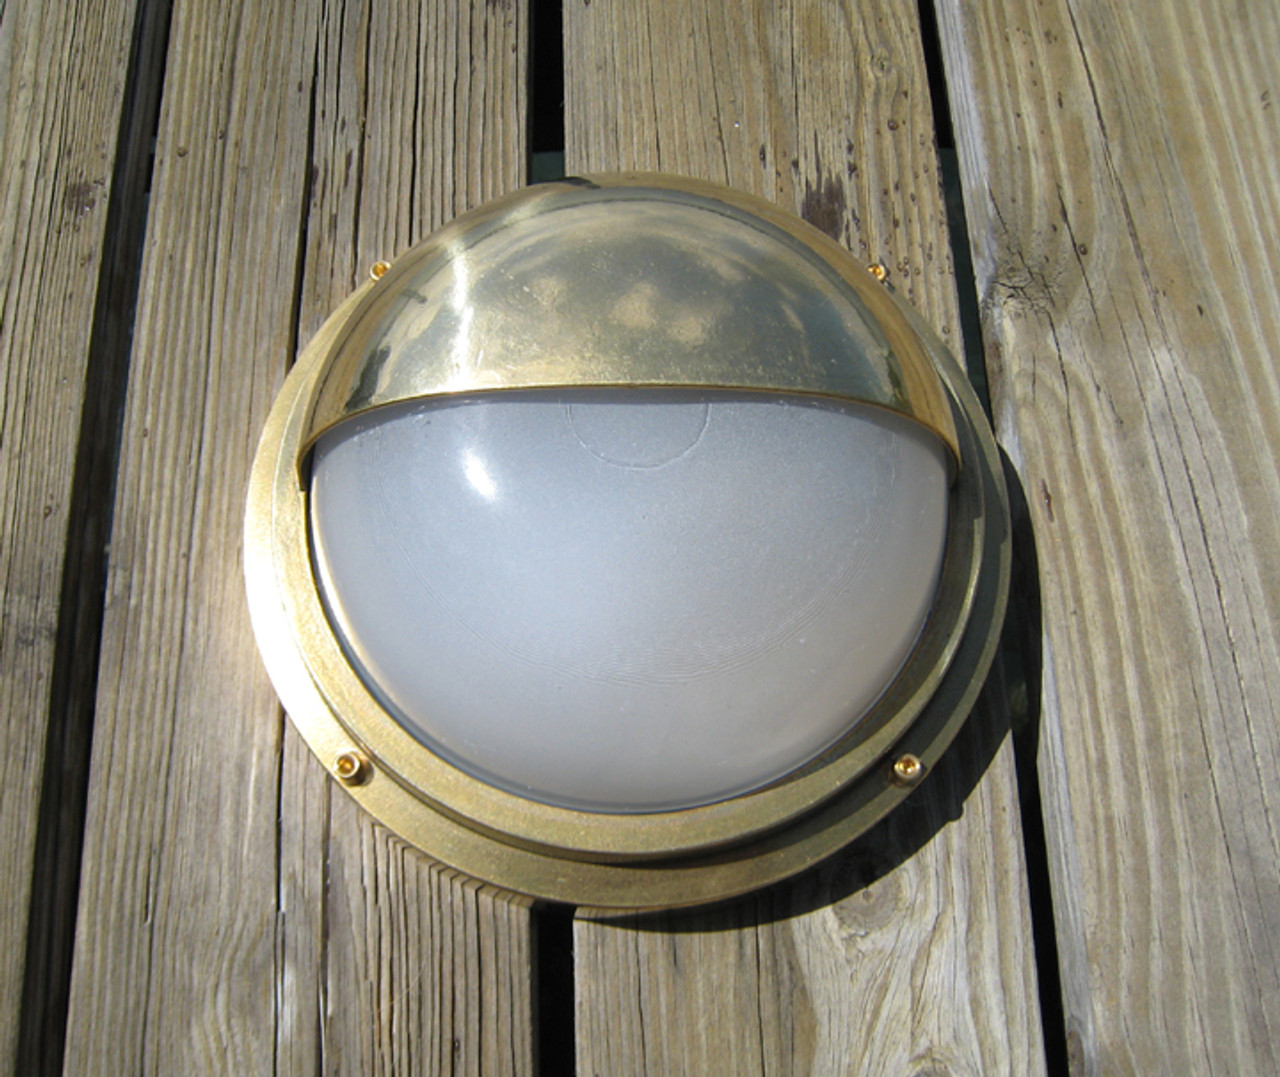 brass eyelid clamshell nautical light